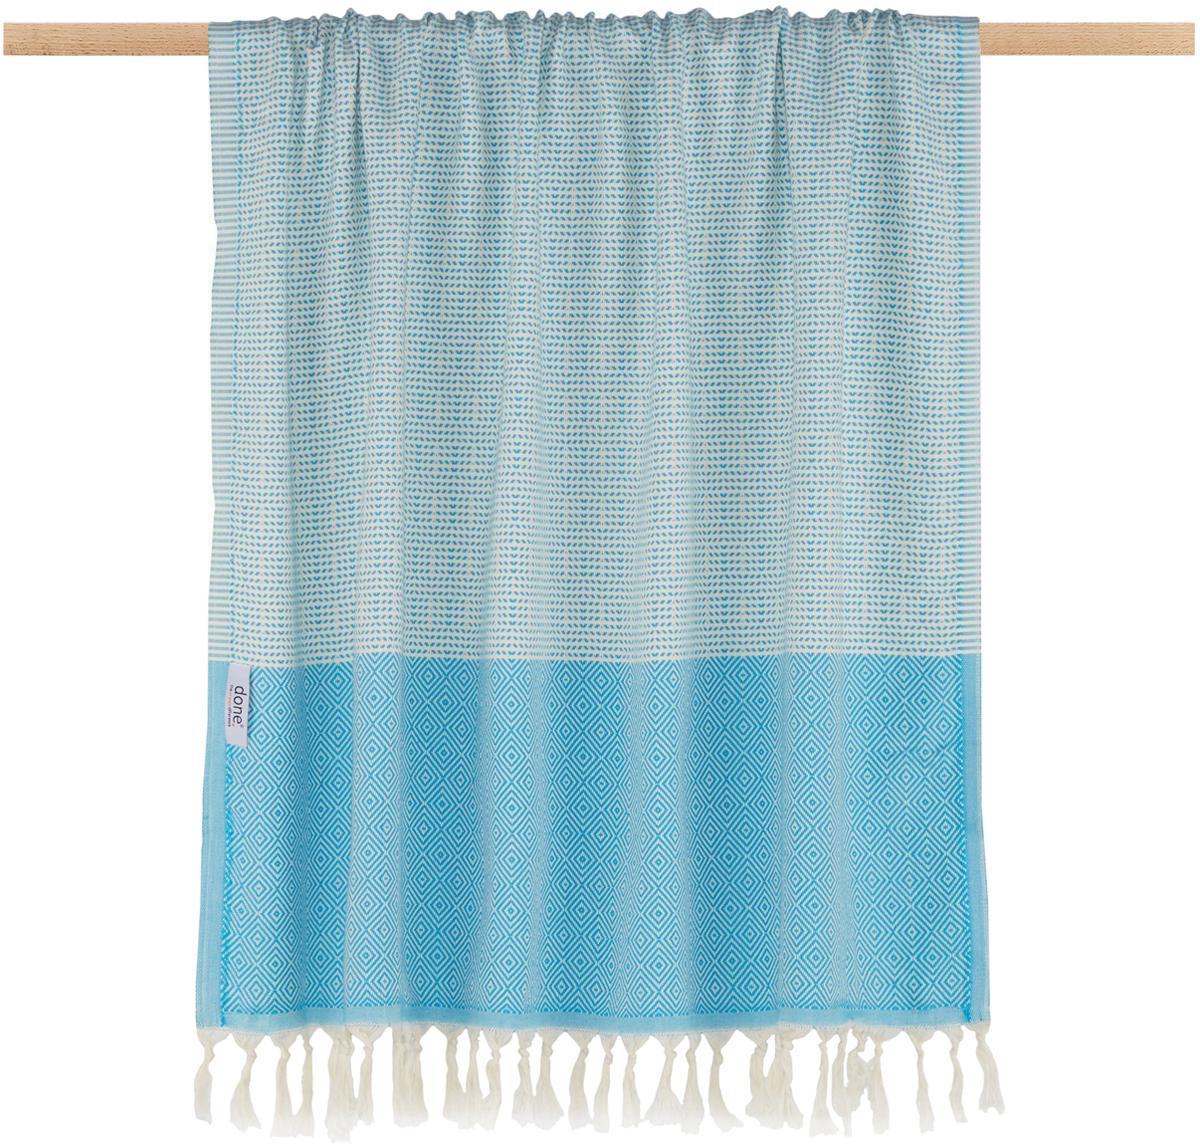 Manta Lounge Diamond, 100%algodón, Azul, blanco crudo, An 100 x L 180 cm